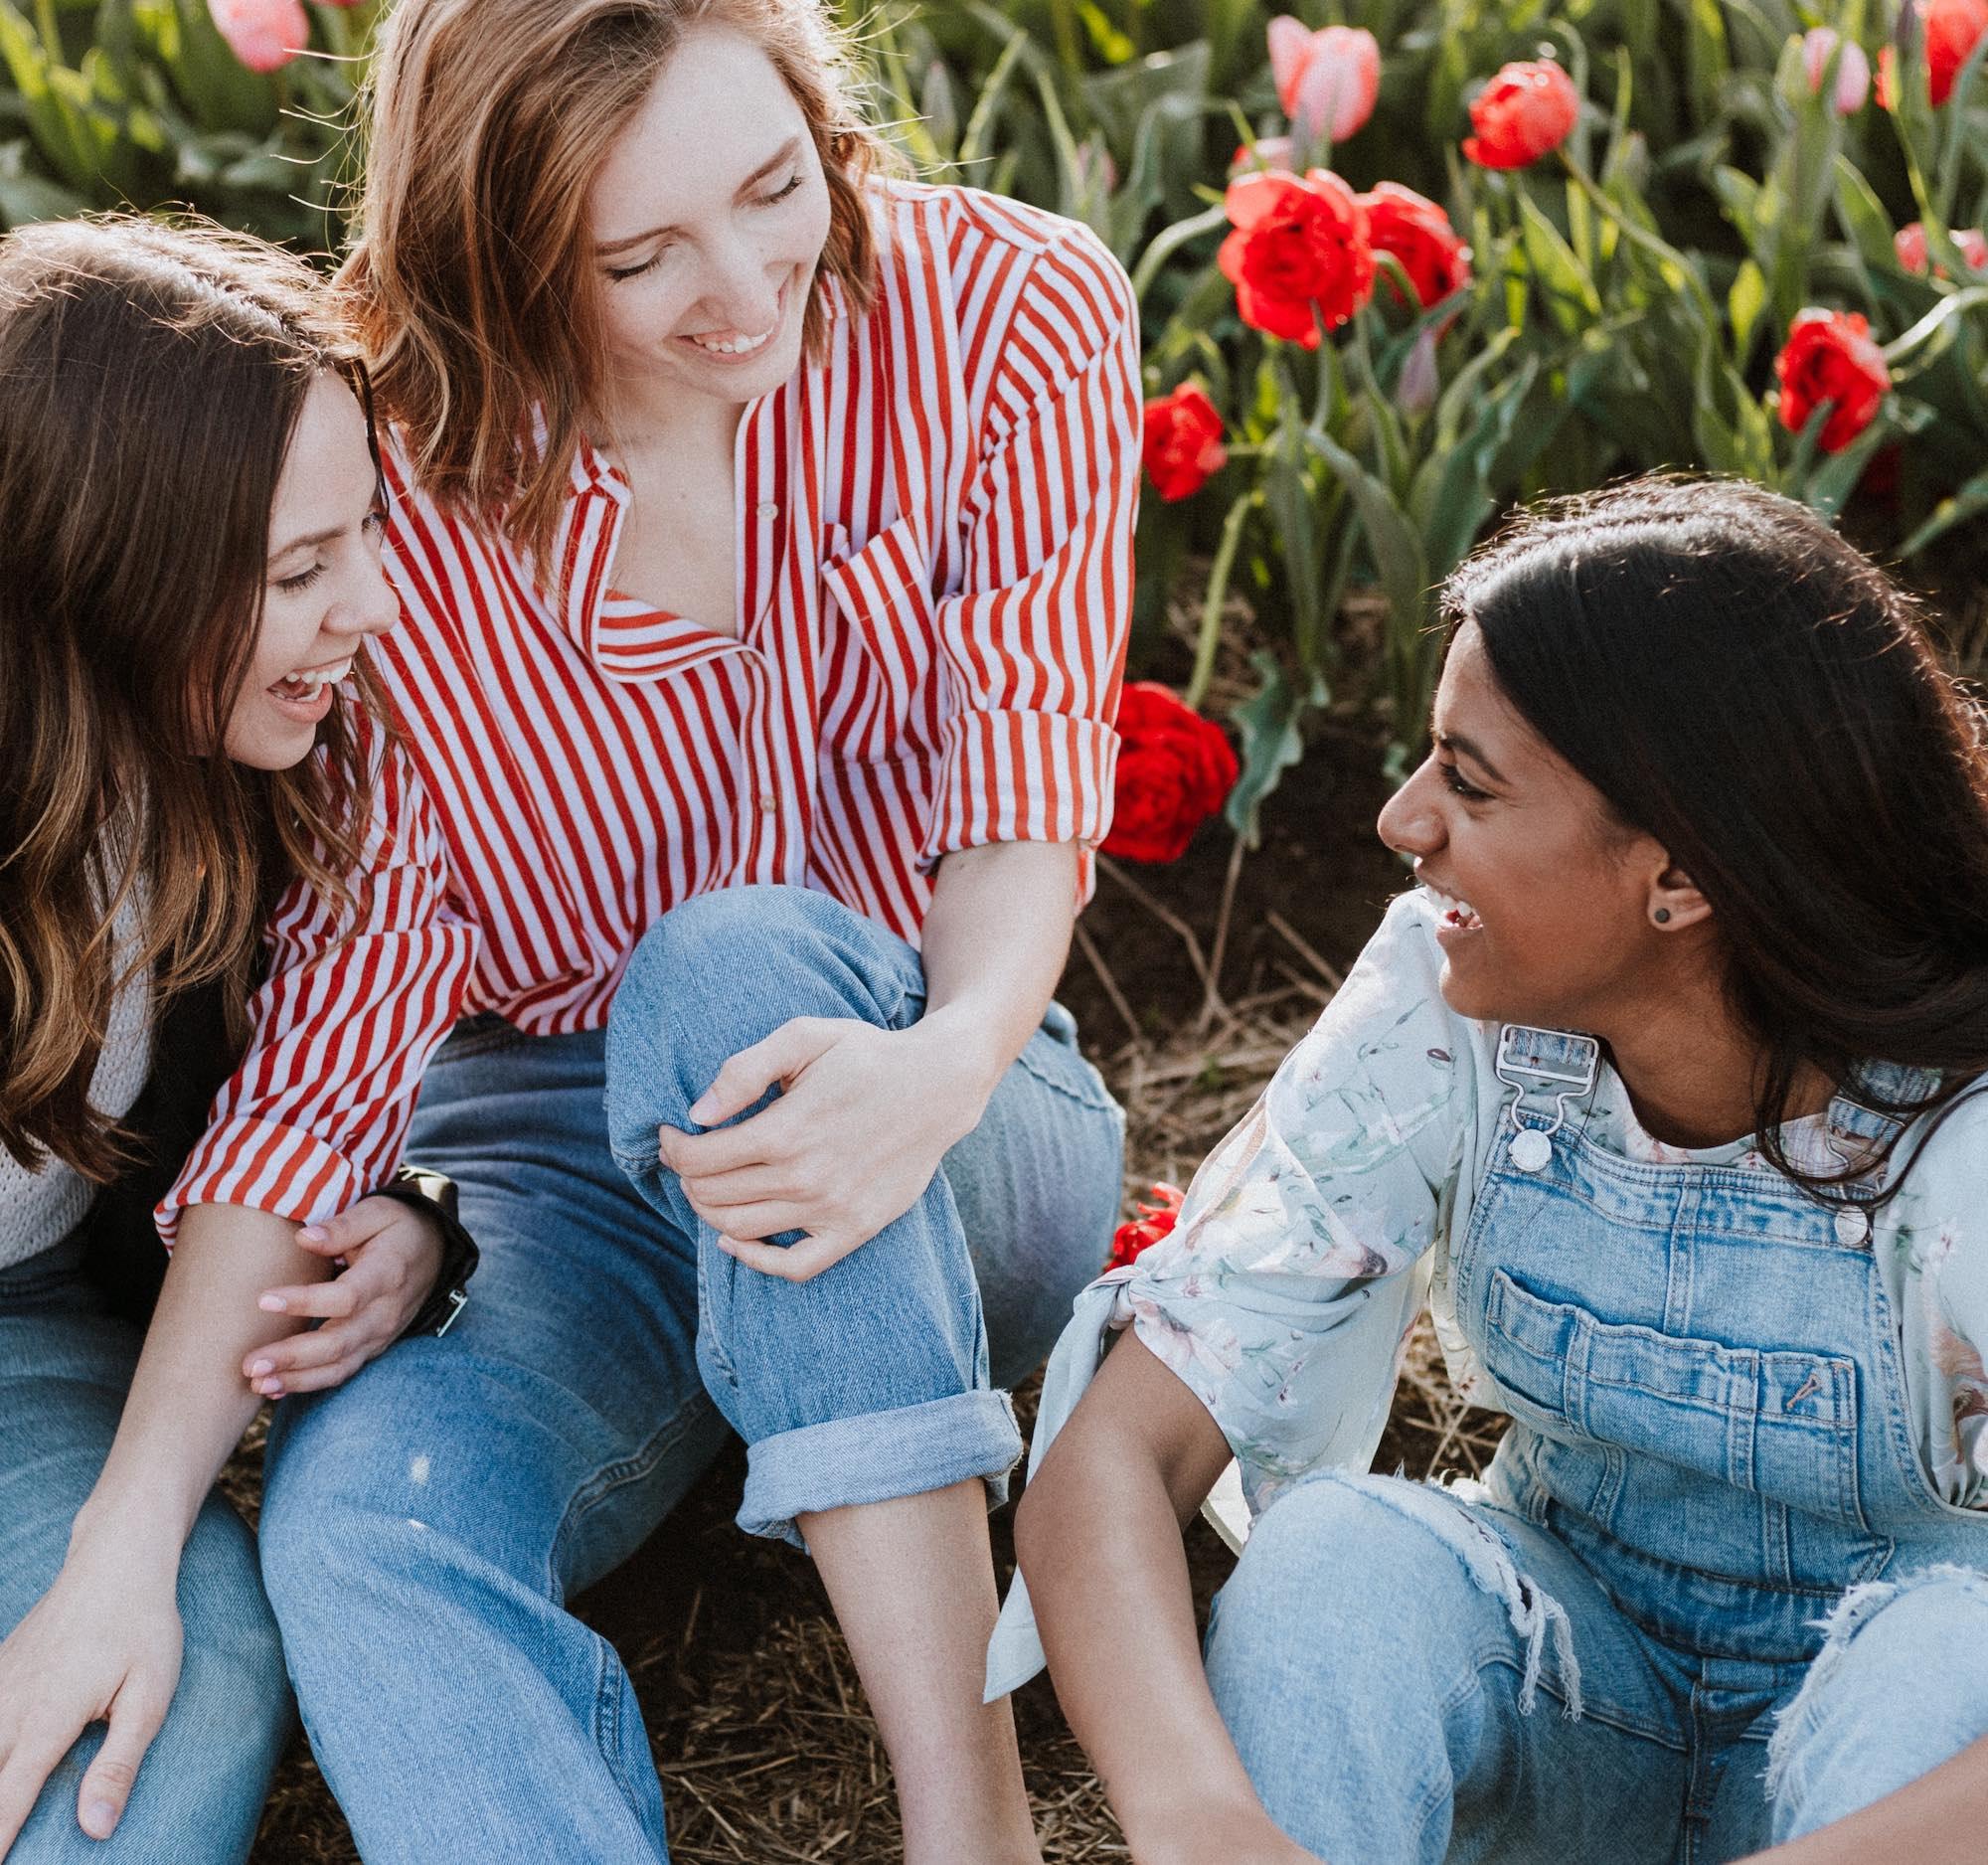 girls talking sitting on the ground